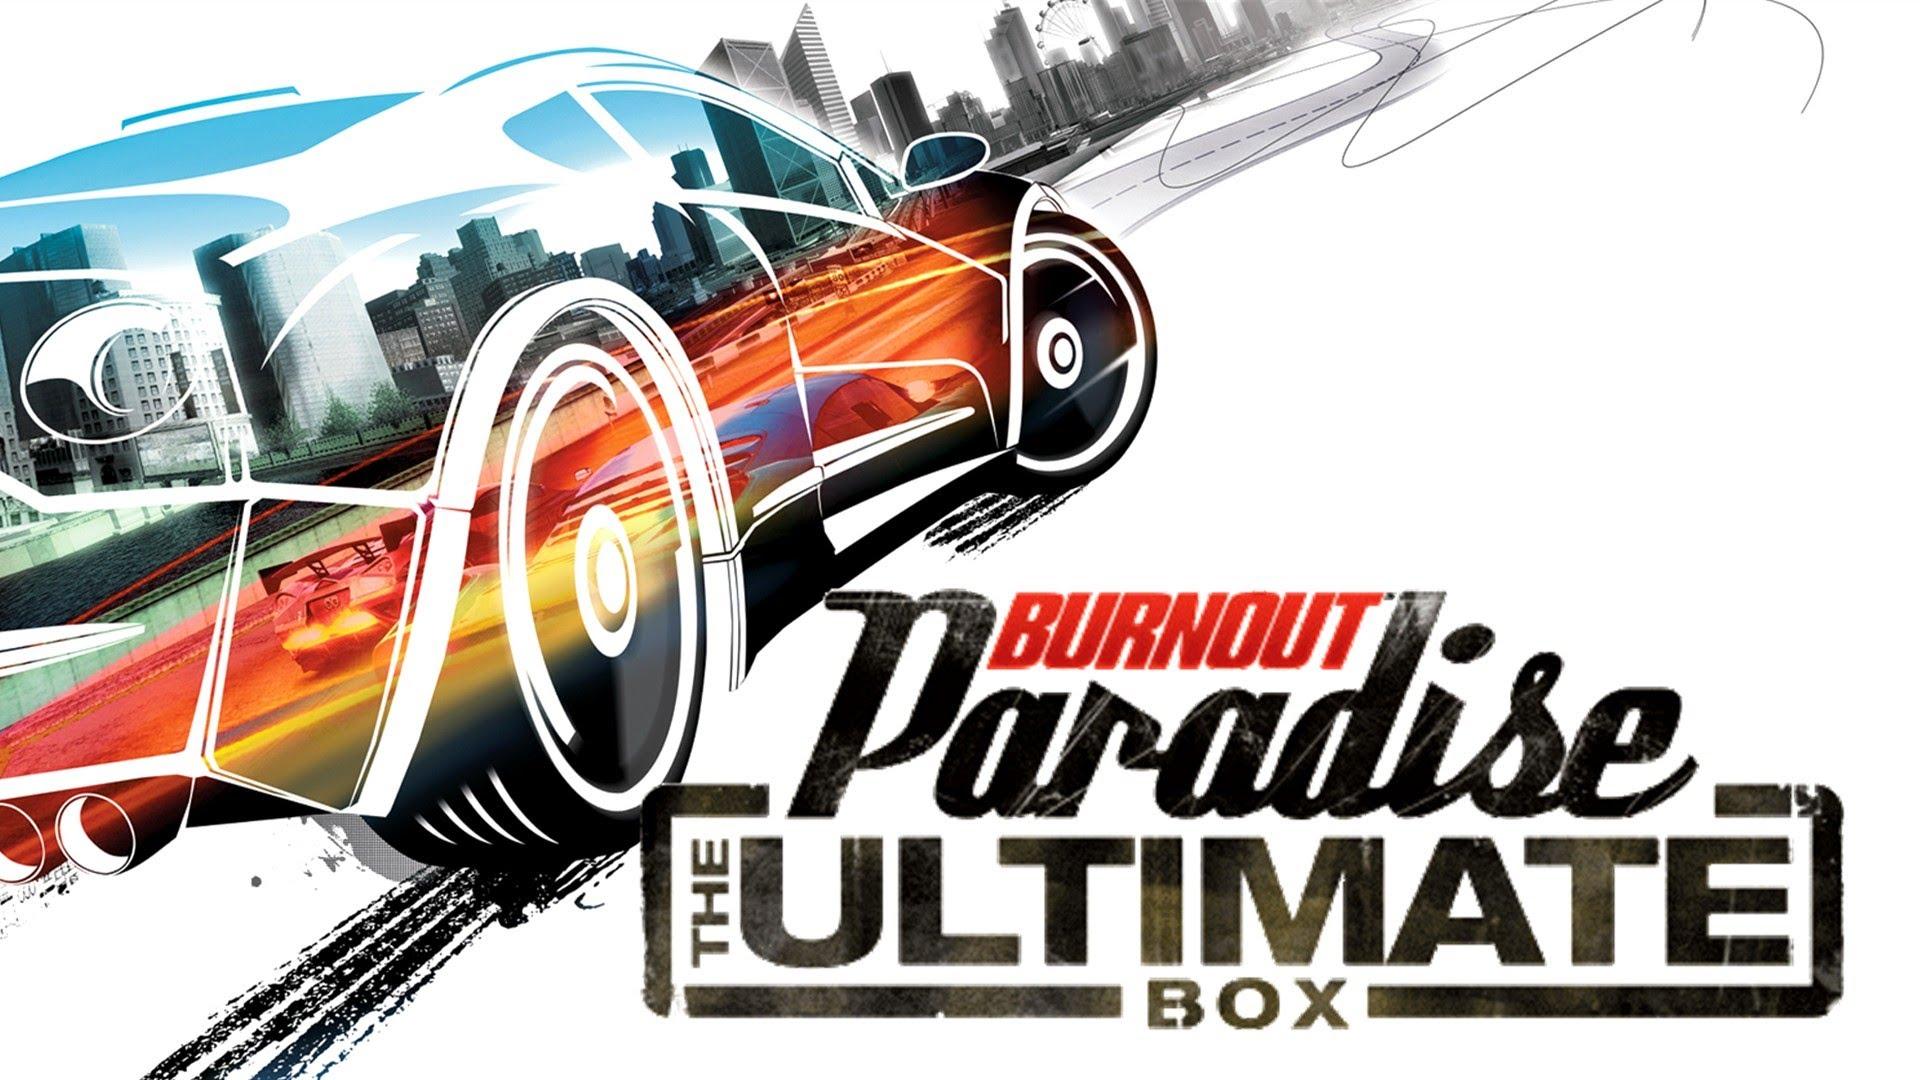 Burnout Paradise The Ultimate Box REGION FREE ORIGIN 2019